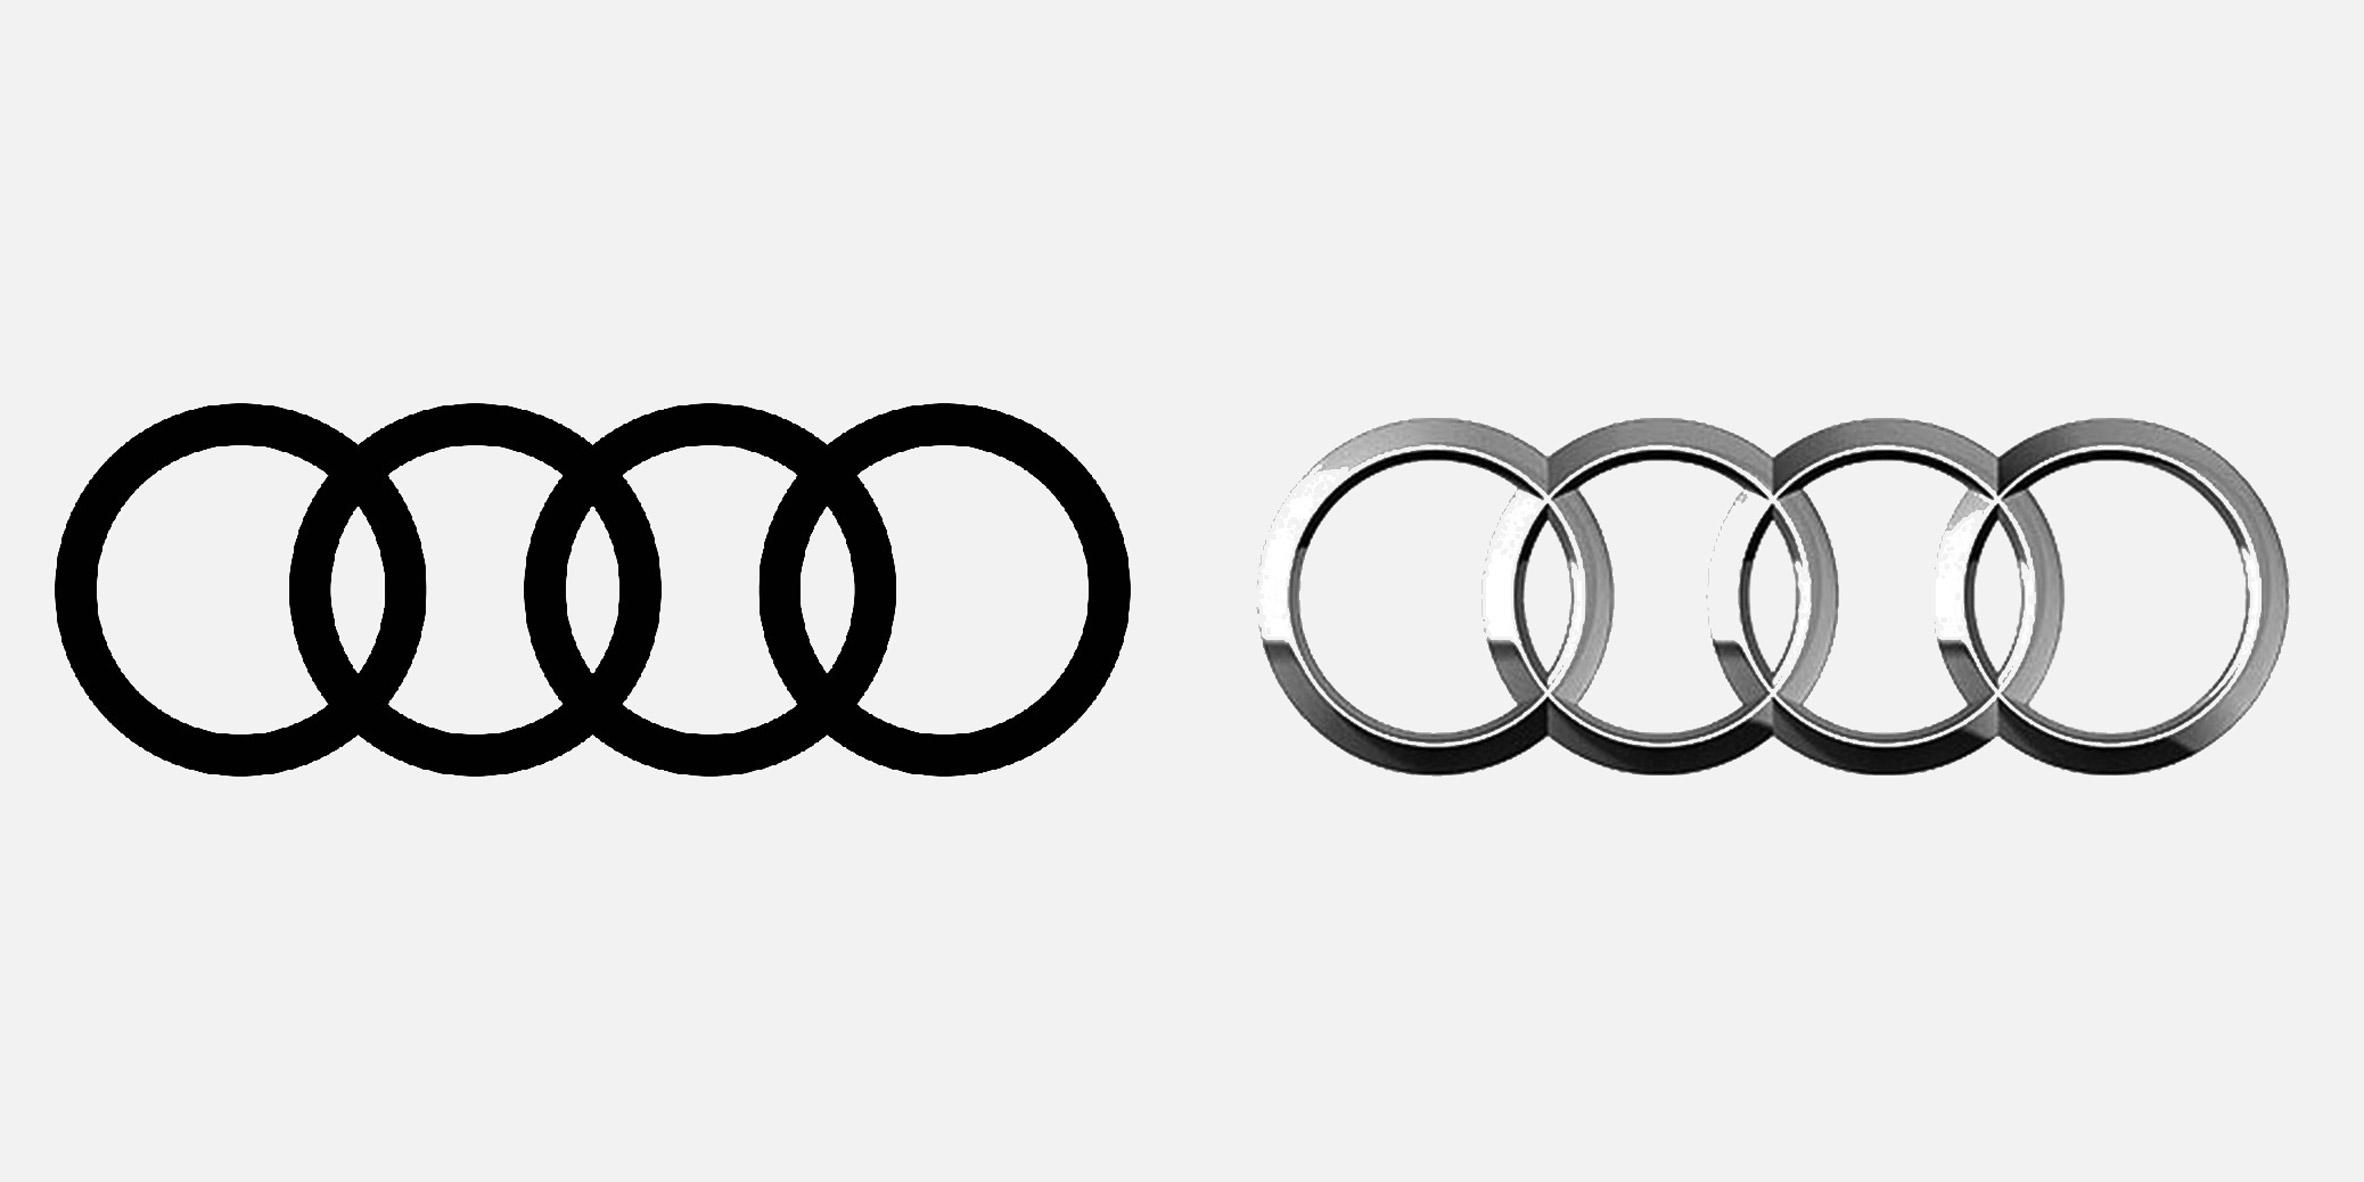 Seven car brands that have returned to flat design for logos